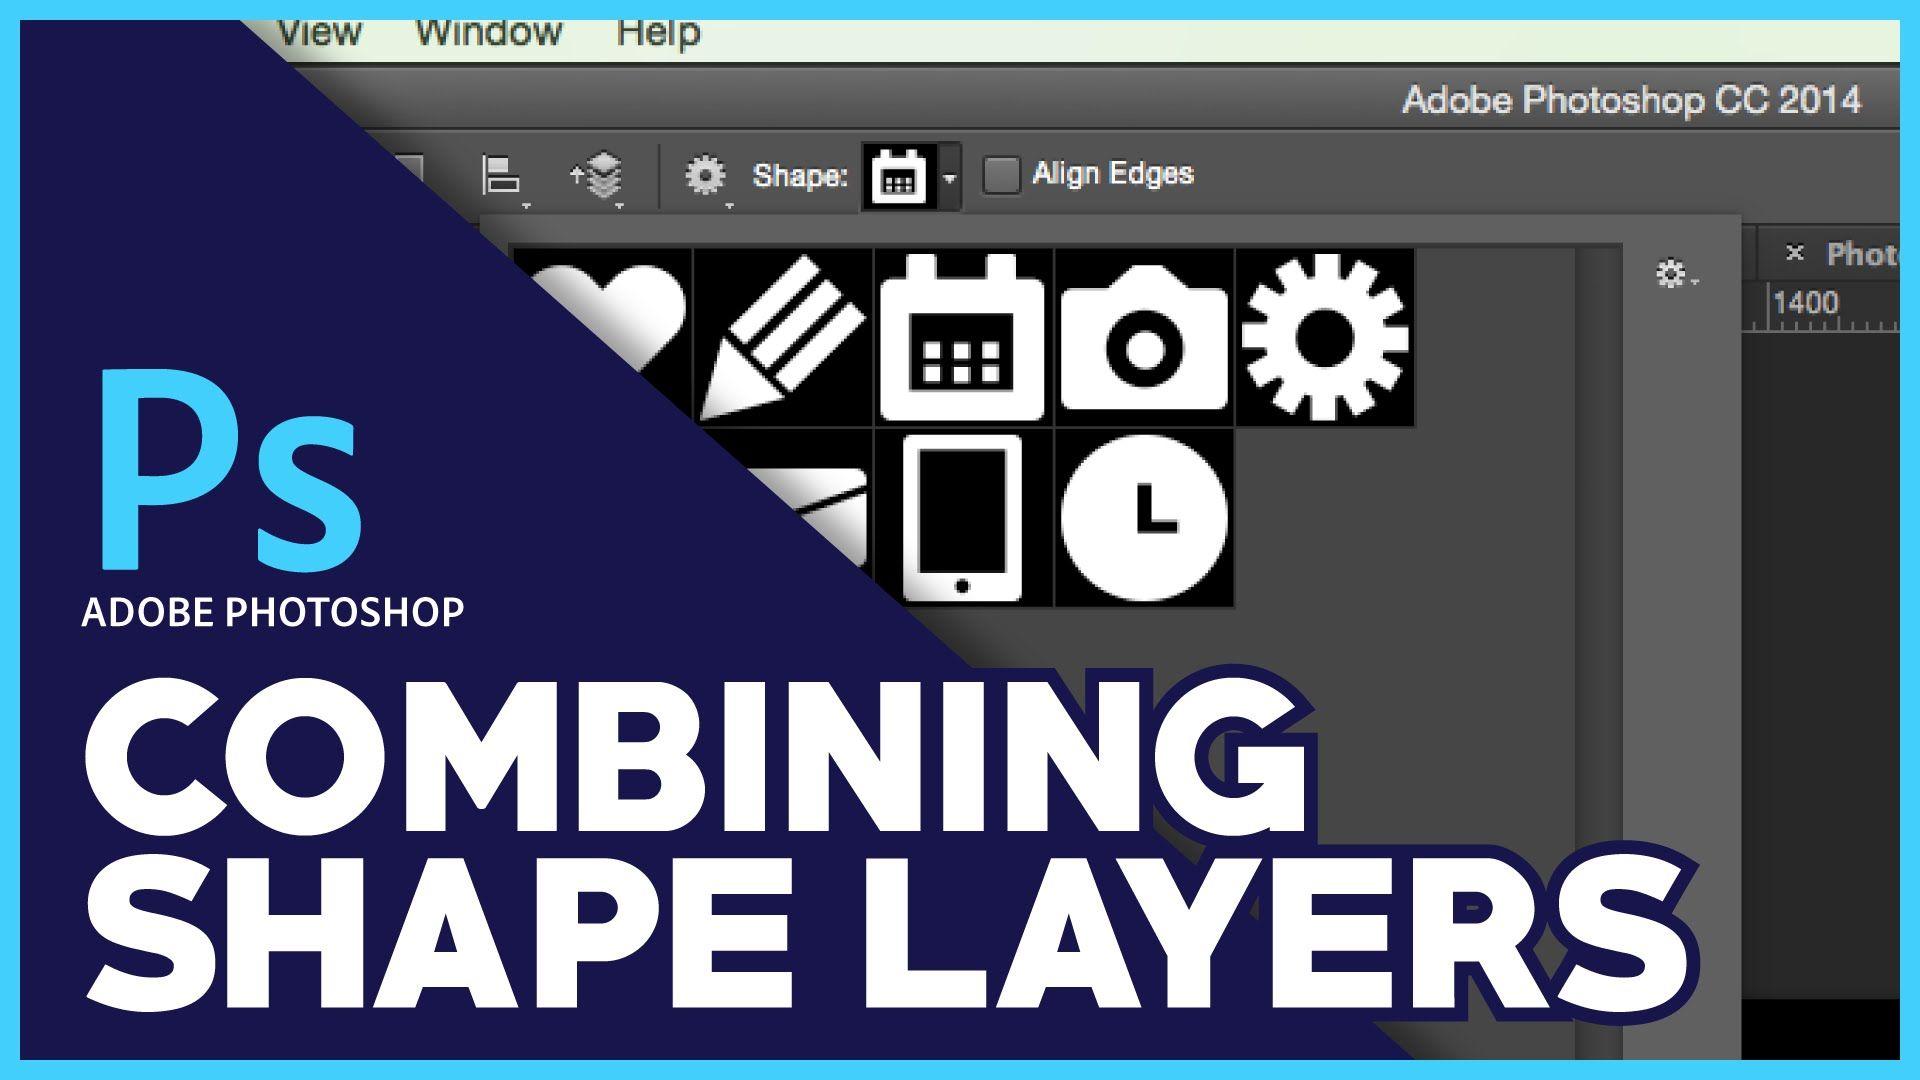 Adobe photoshop combine shape layers tutorial adobe photoshop adobe photoshop combine shape layers tutorial baditri Image collections